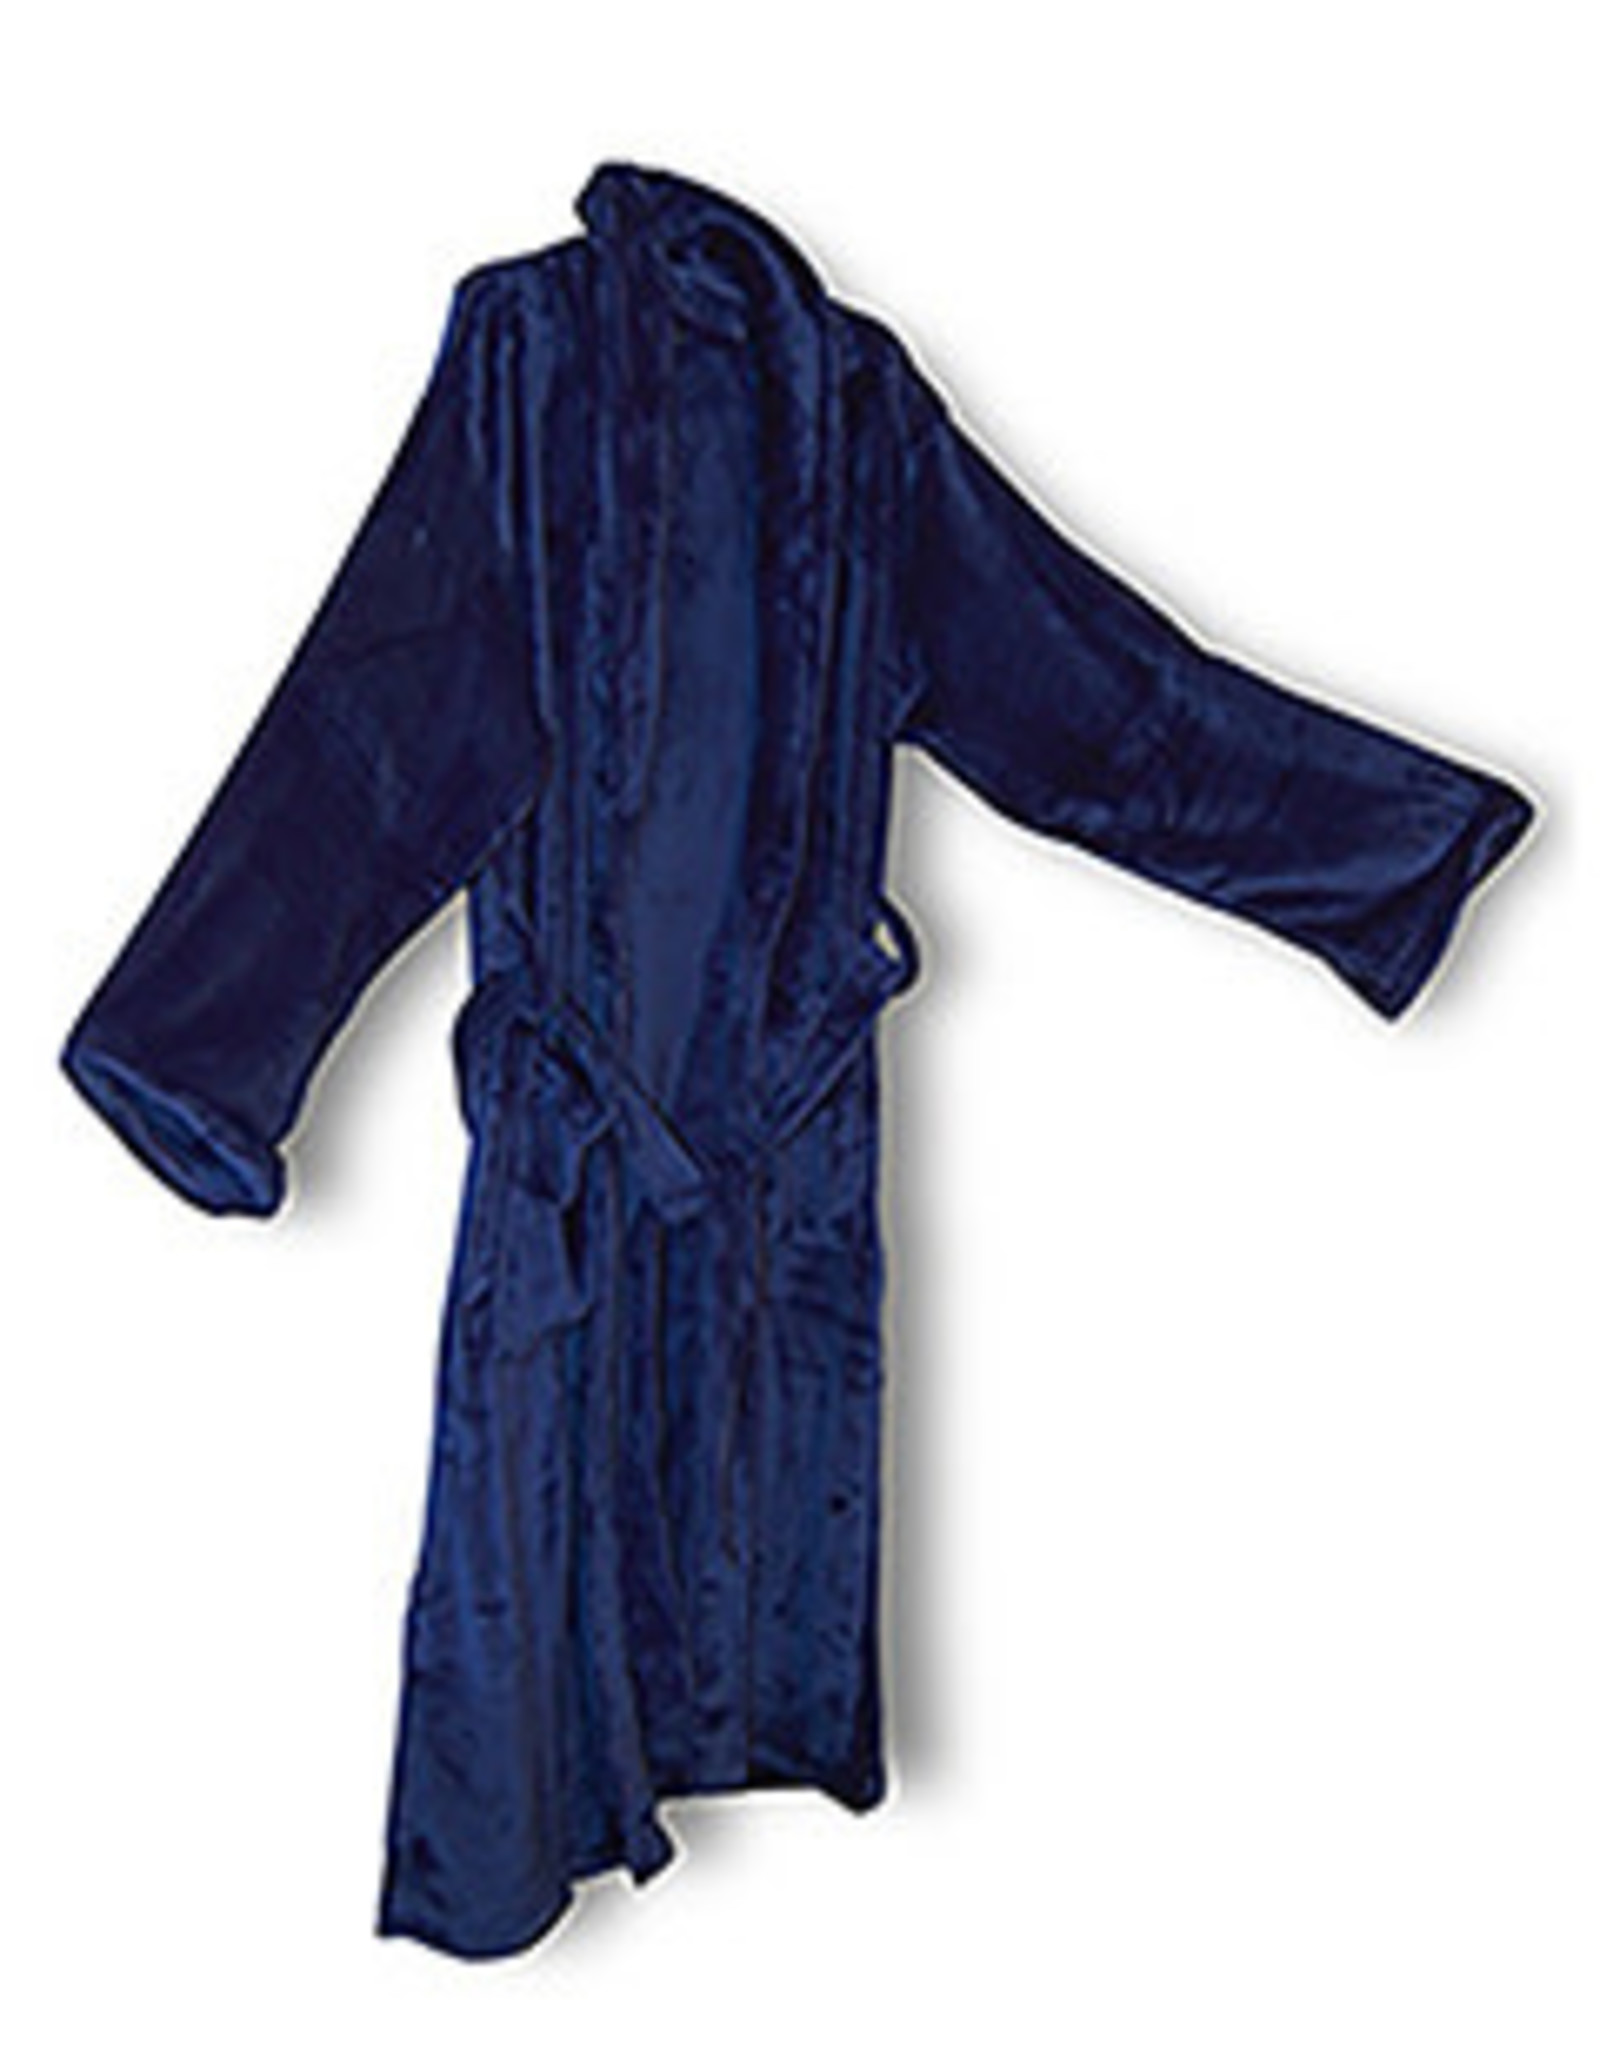 NON-UNIFORM JD Mink Luxury Robe